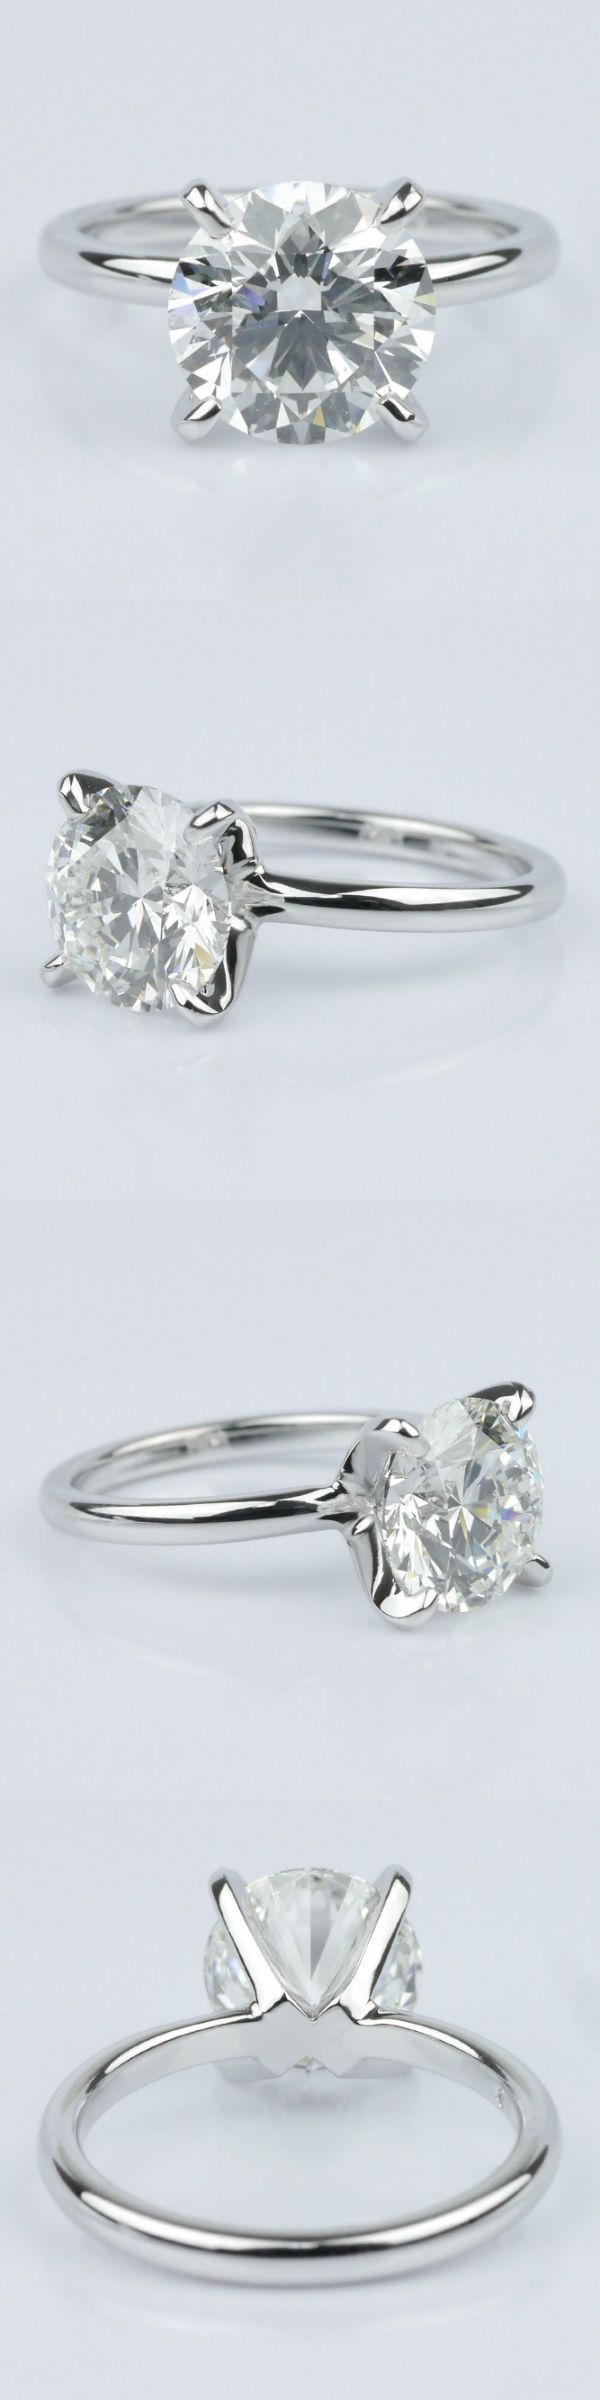 Classic Platinum Solitaire Engagement Ring (2.30 ct.) Round 2.30 Ctw. Color: F Clarity: SI1 Cut: Super Ideal Certification: GIA Diamond/Gem Cost: $24,650 Round Loose Diamond Metal: Platinum Setting Cost: $2,642